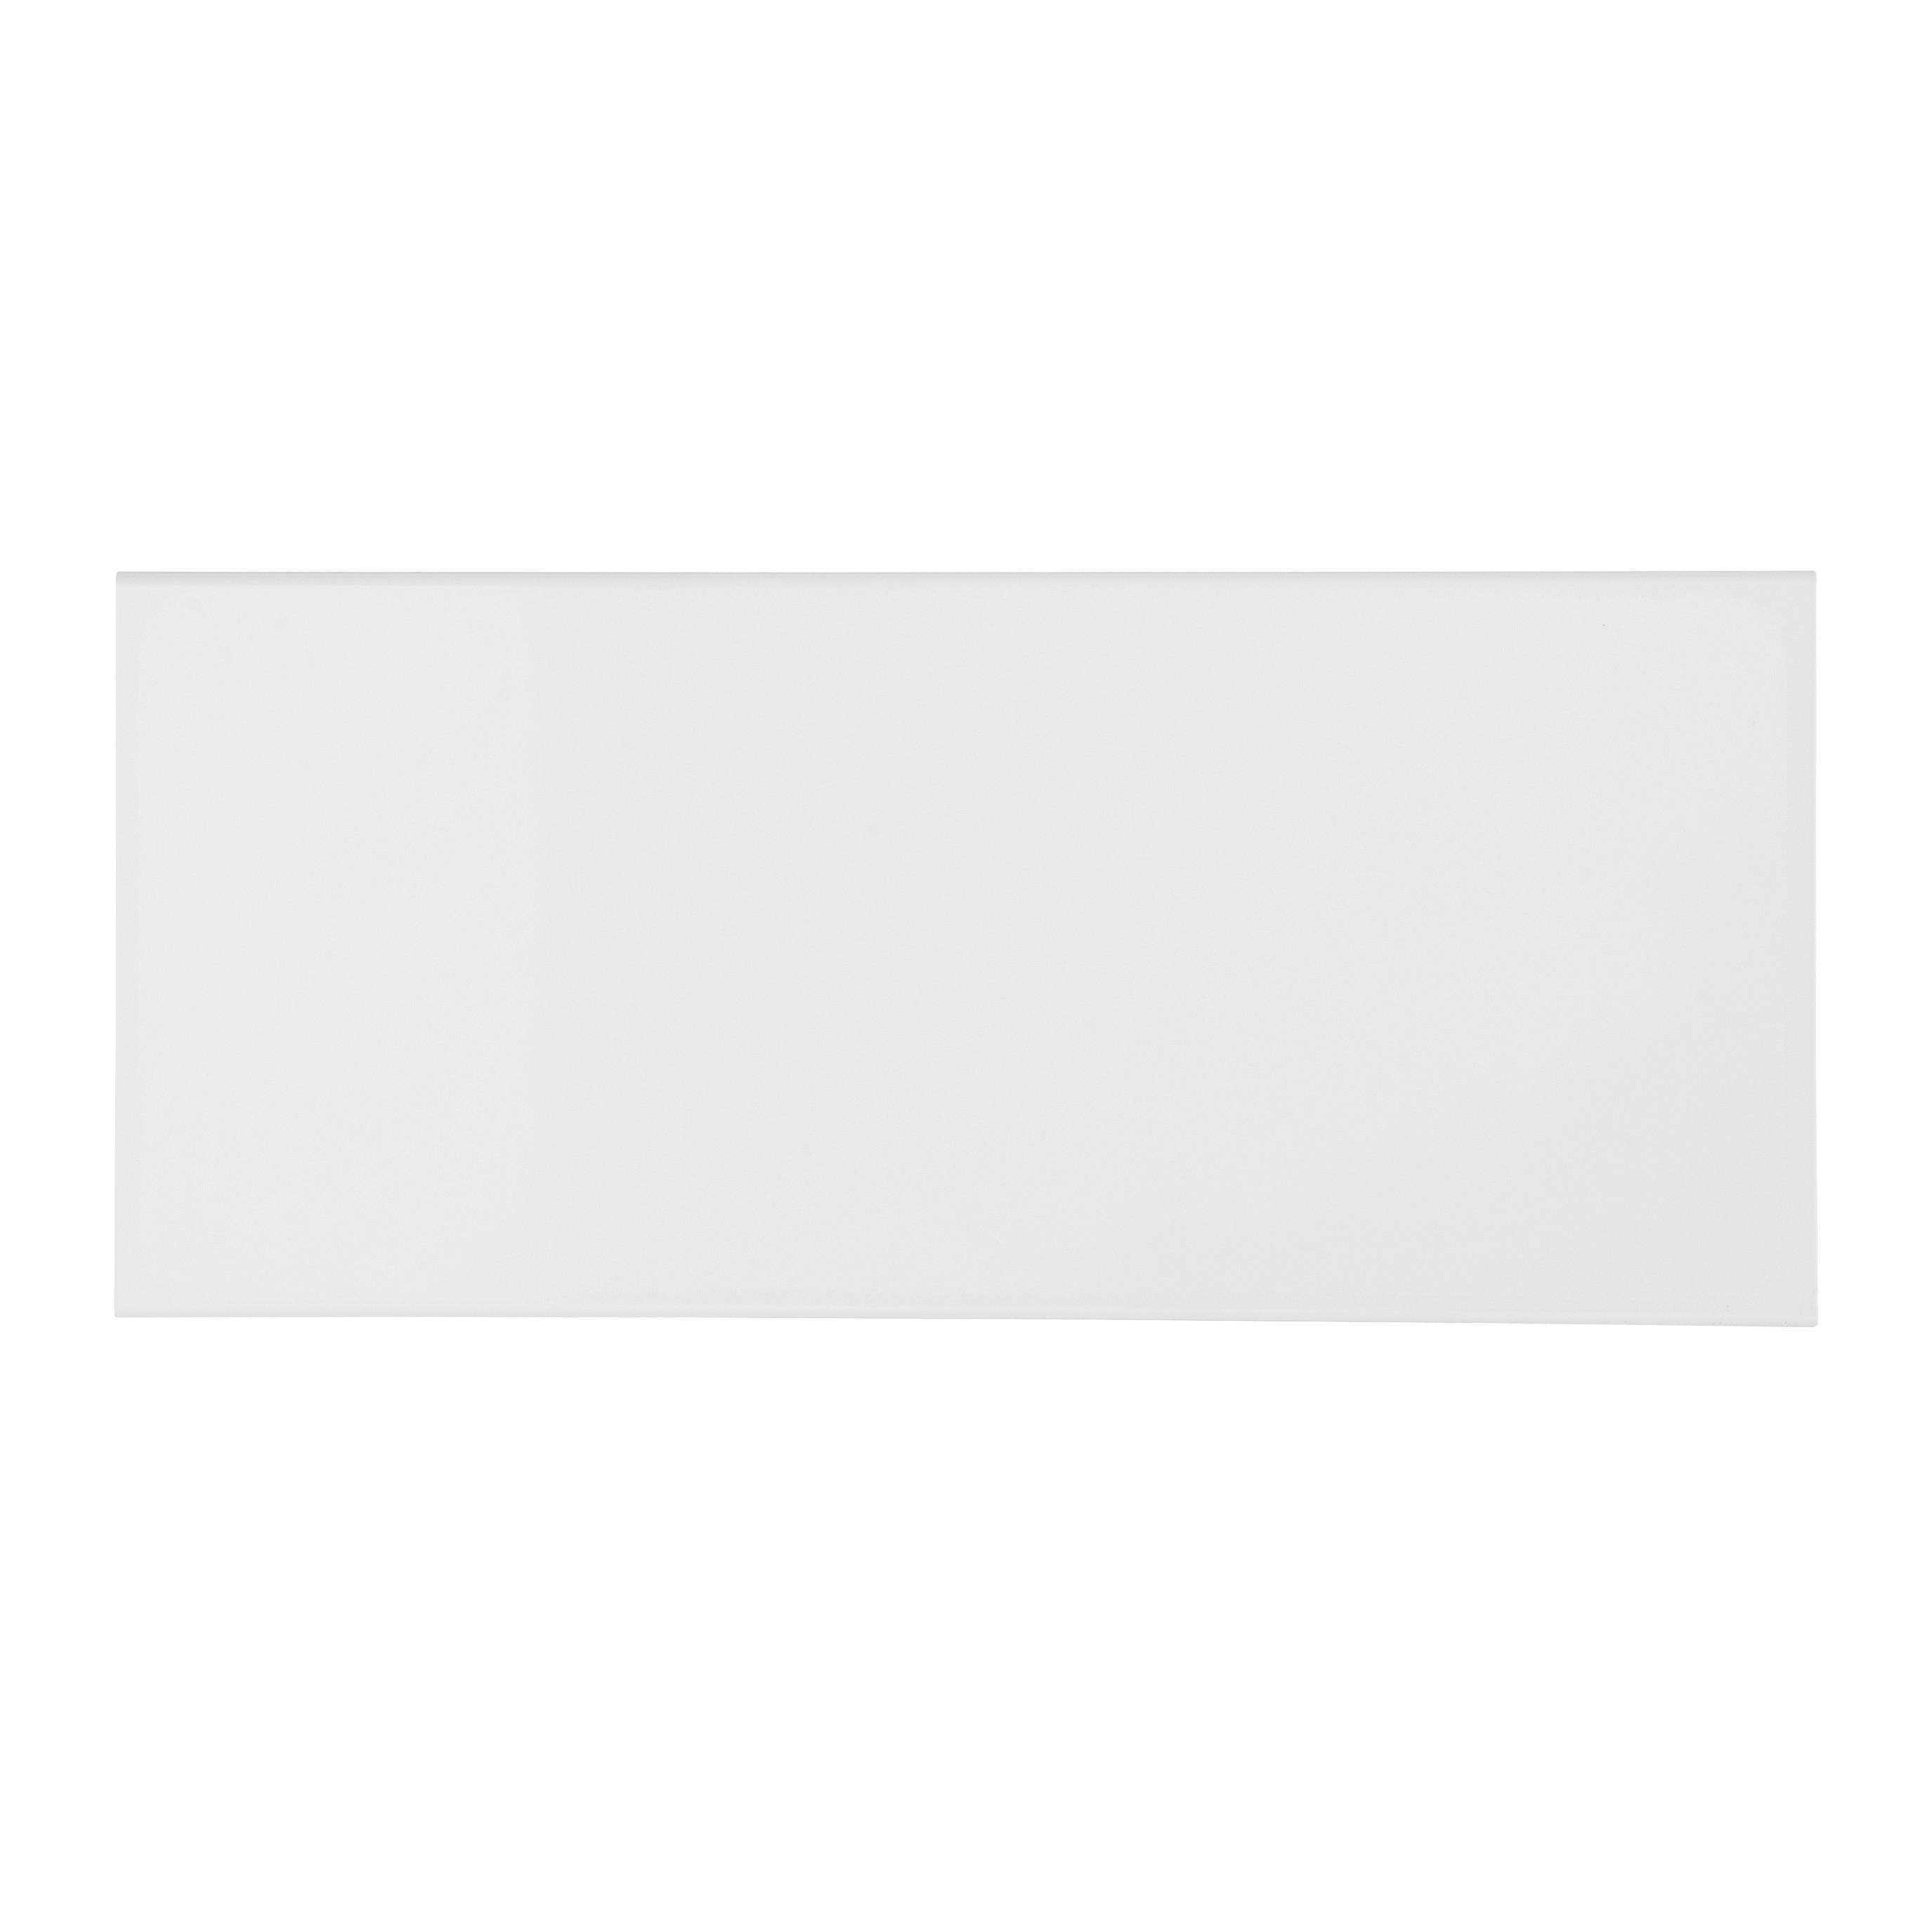 410046 : Adax Neo panelovn m/WiFi H 14 (hvit)